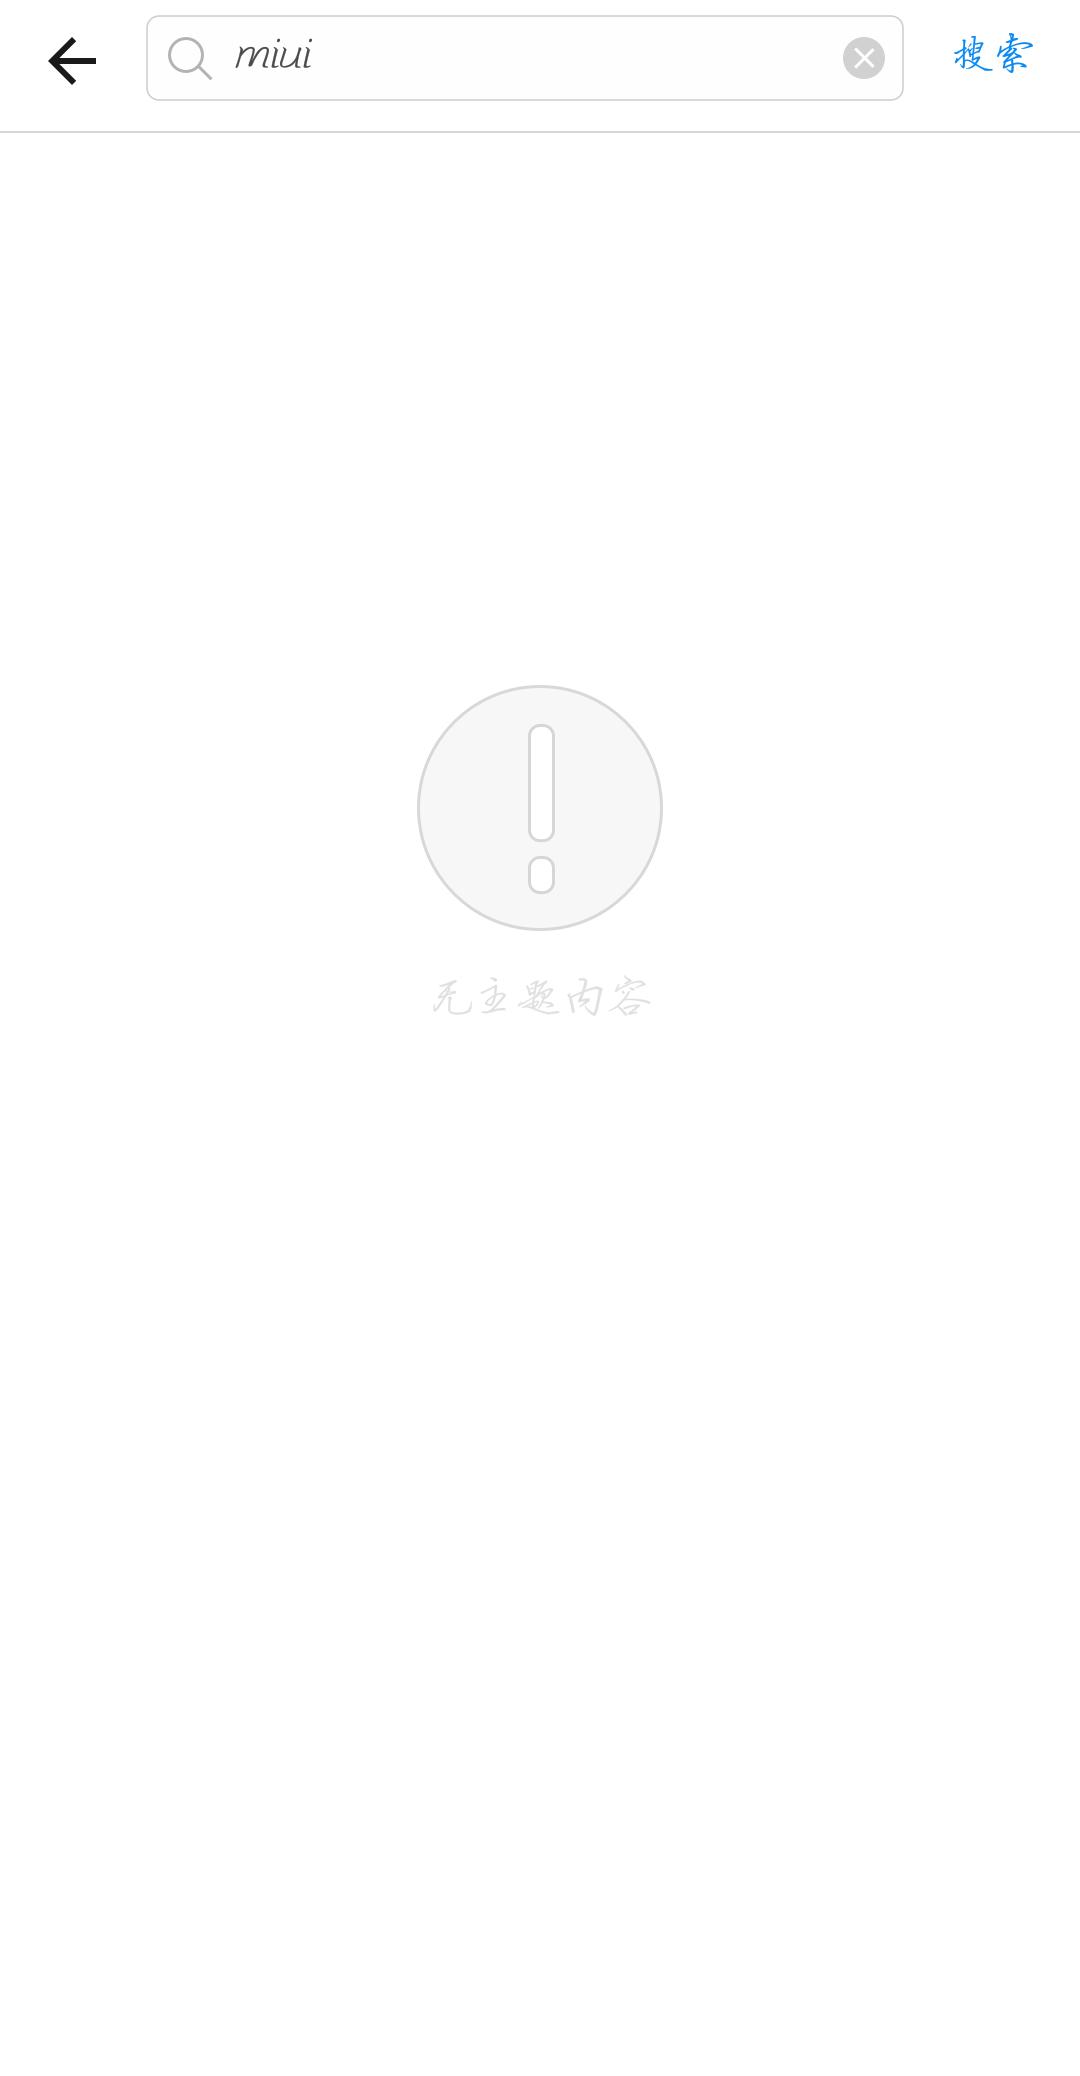 Screenshot_2018-08-16-09-46-16.png